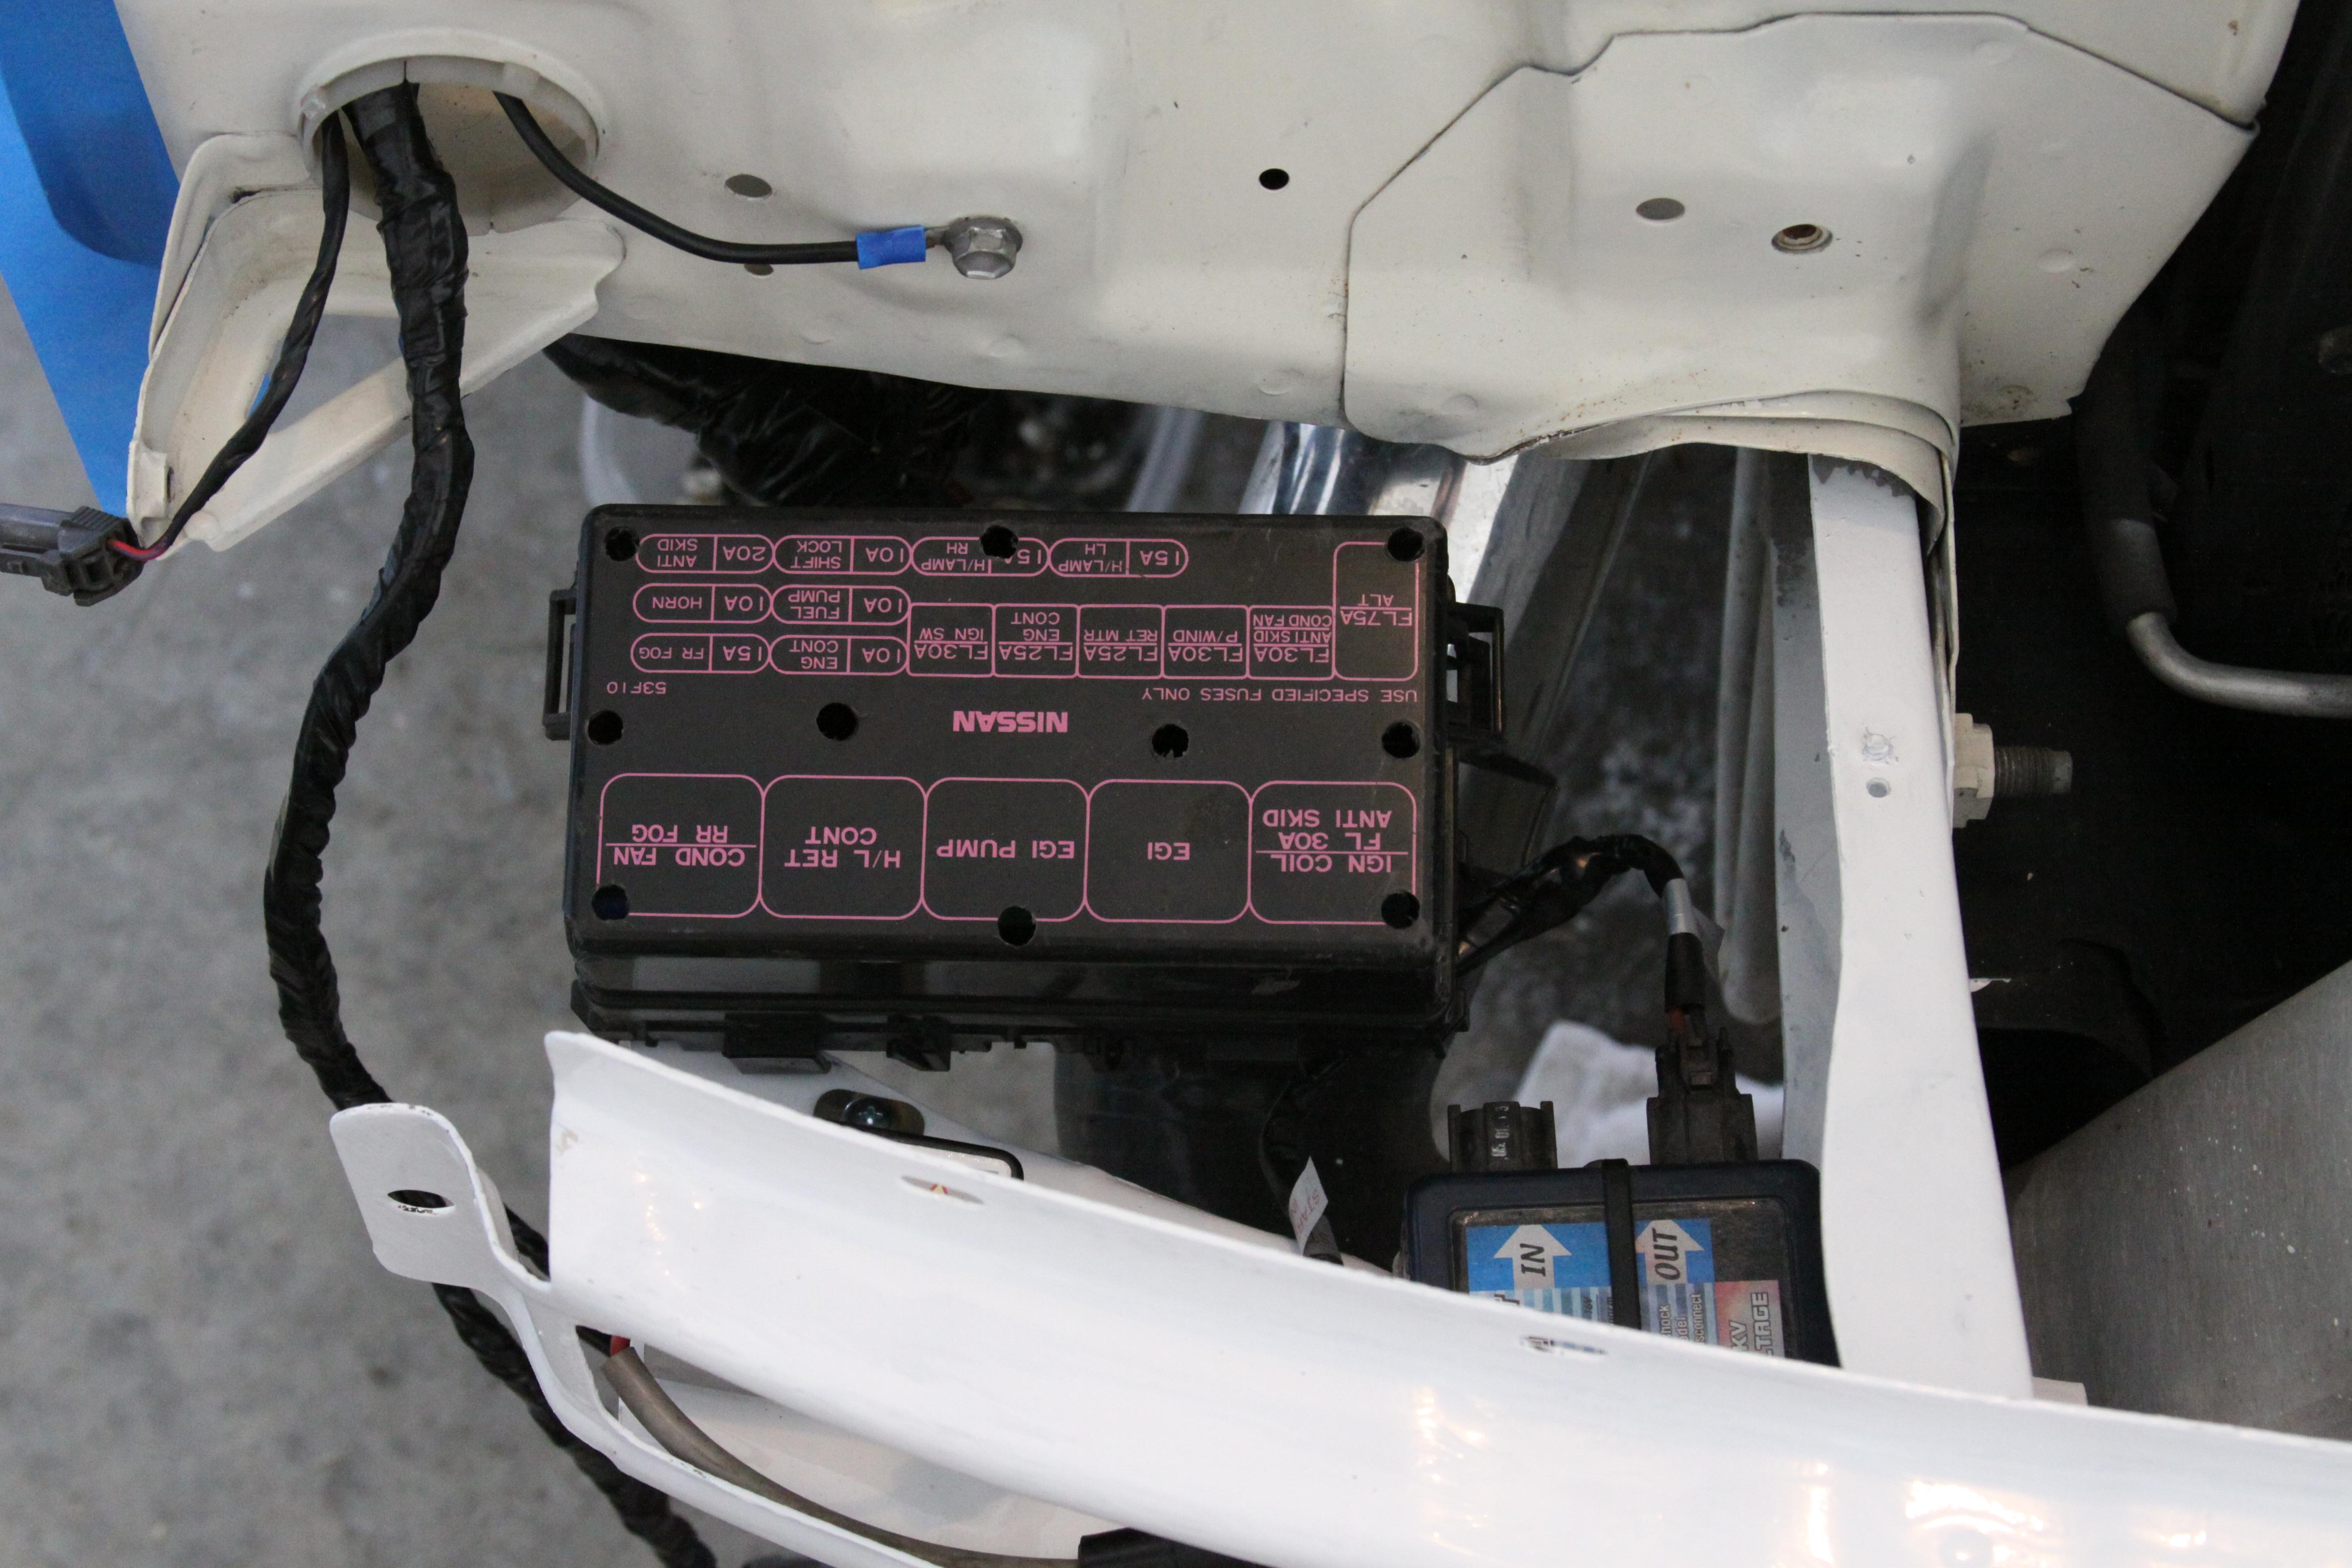 1995 240sx Fuse Box Wiring Diagram Libraries For Buick Lesabre Custom S13 Diagramscustom Simple Schema